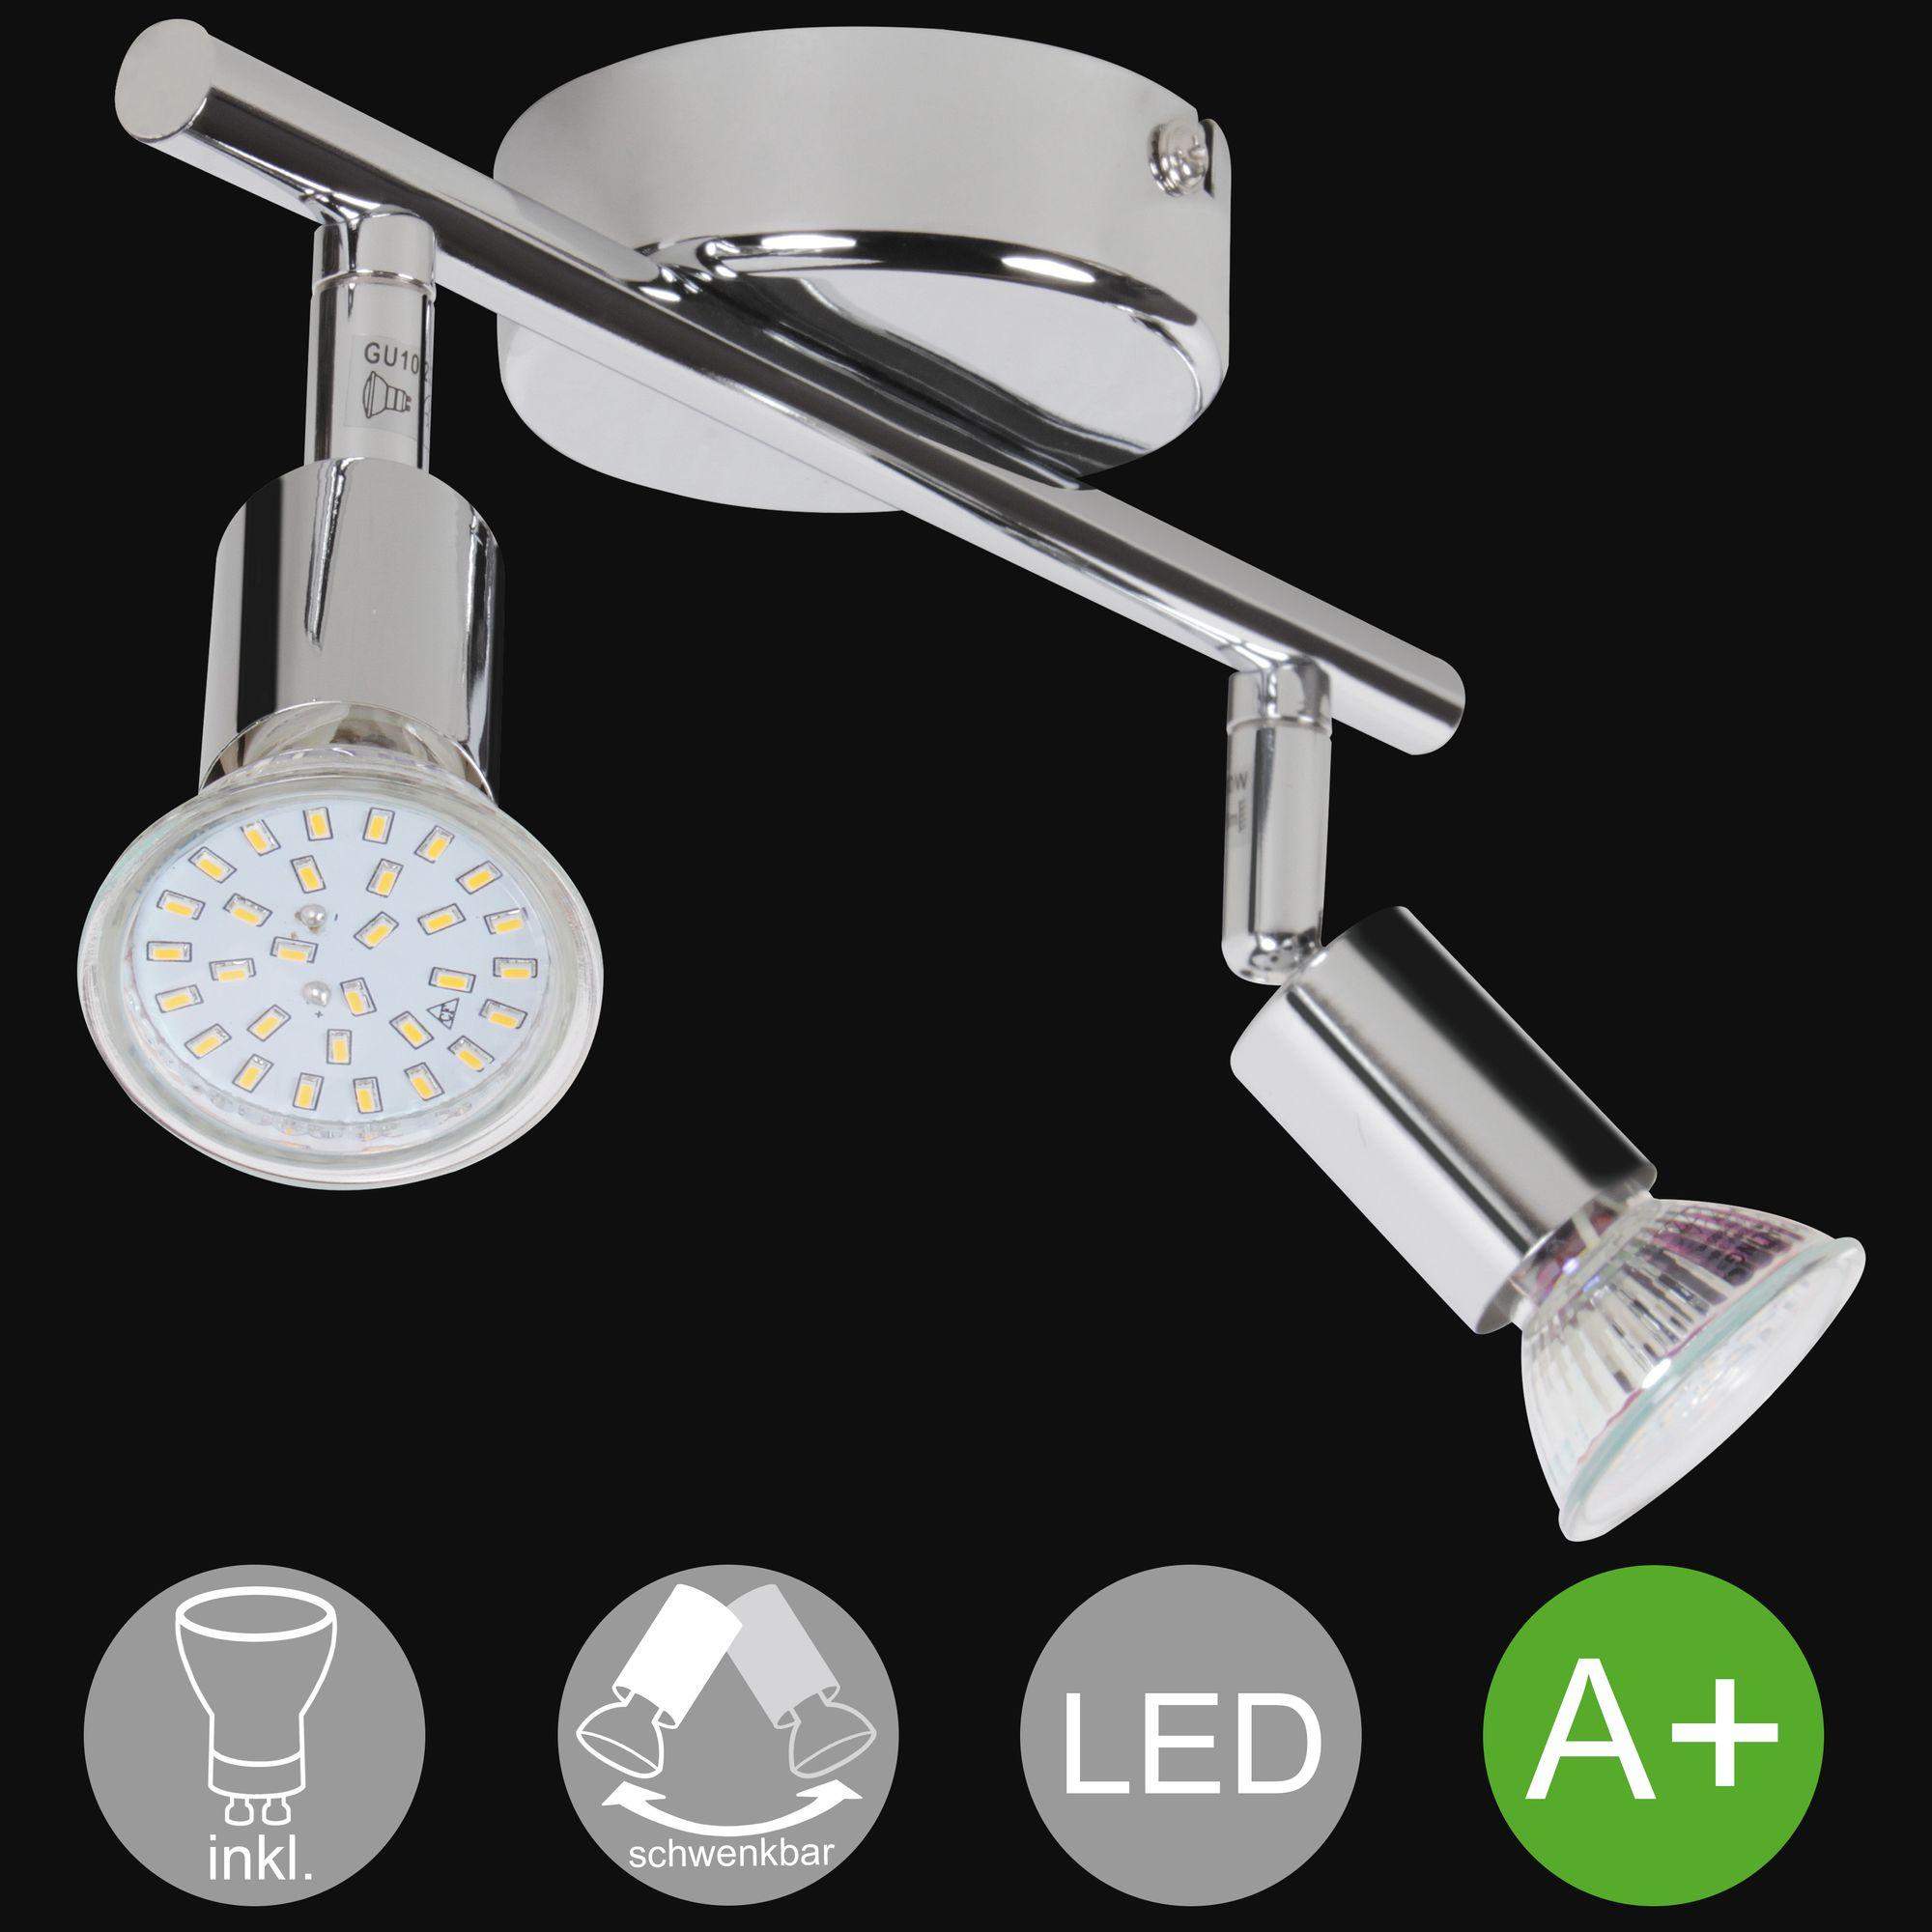 2-flammiger LED-Strahler Deckenlampe Wandlampe inkl. 2x3W Leuchtmittel  (EEK: A+)